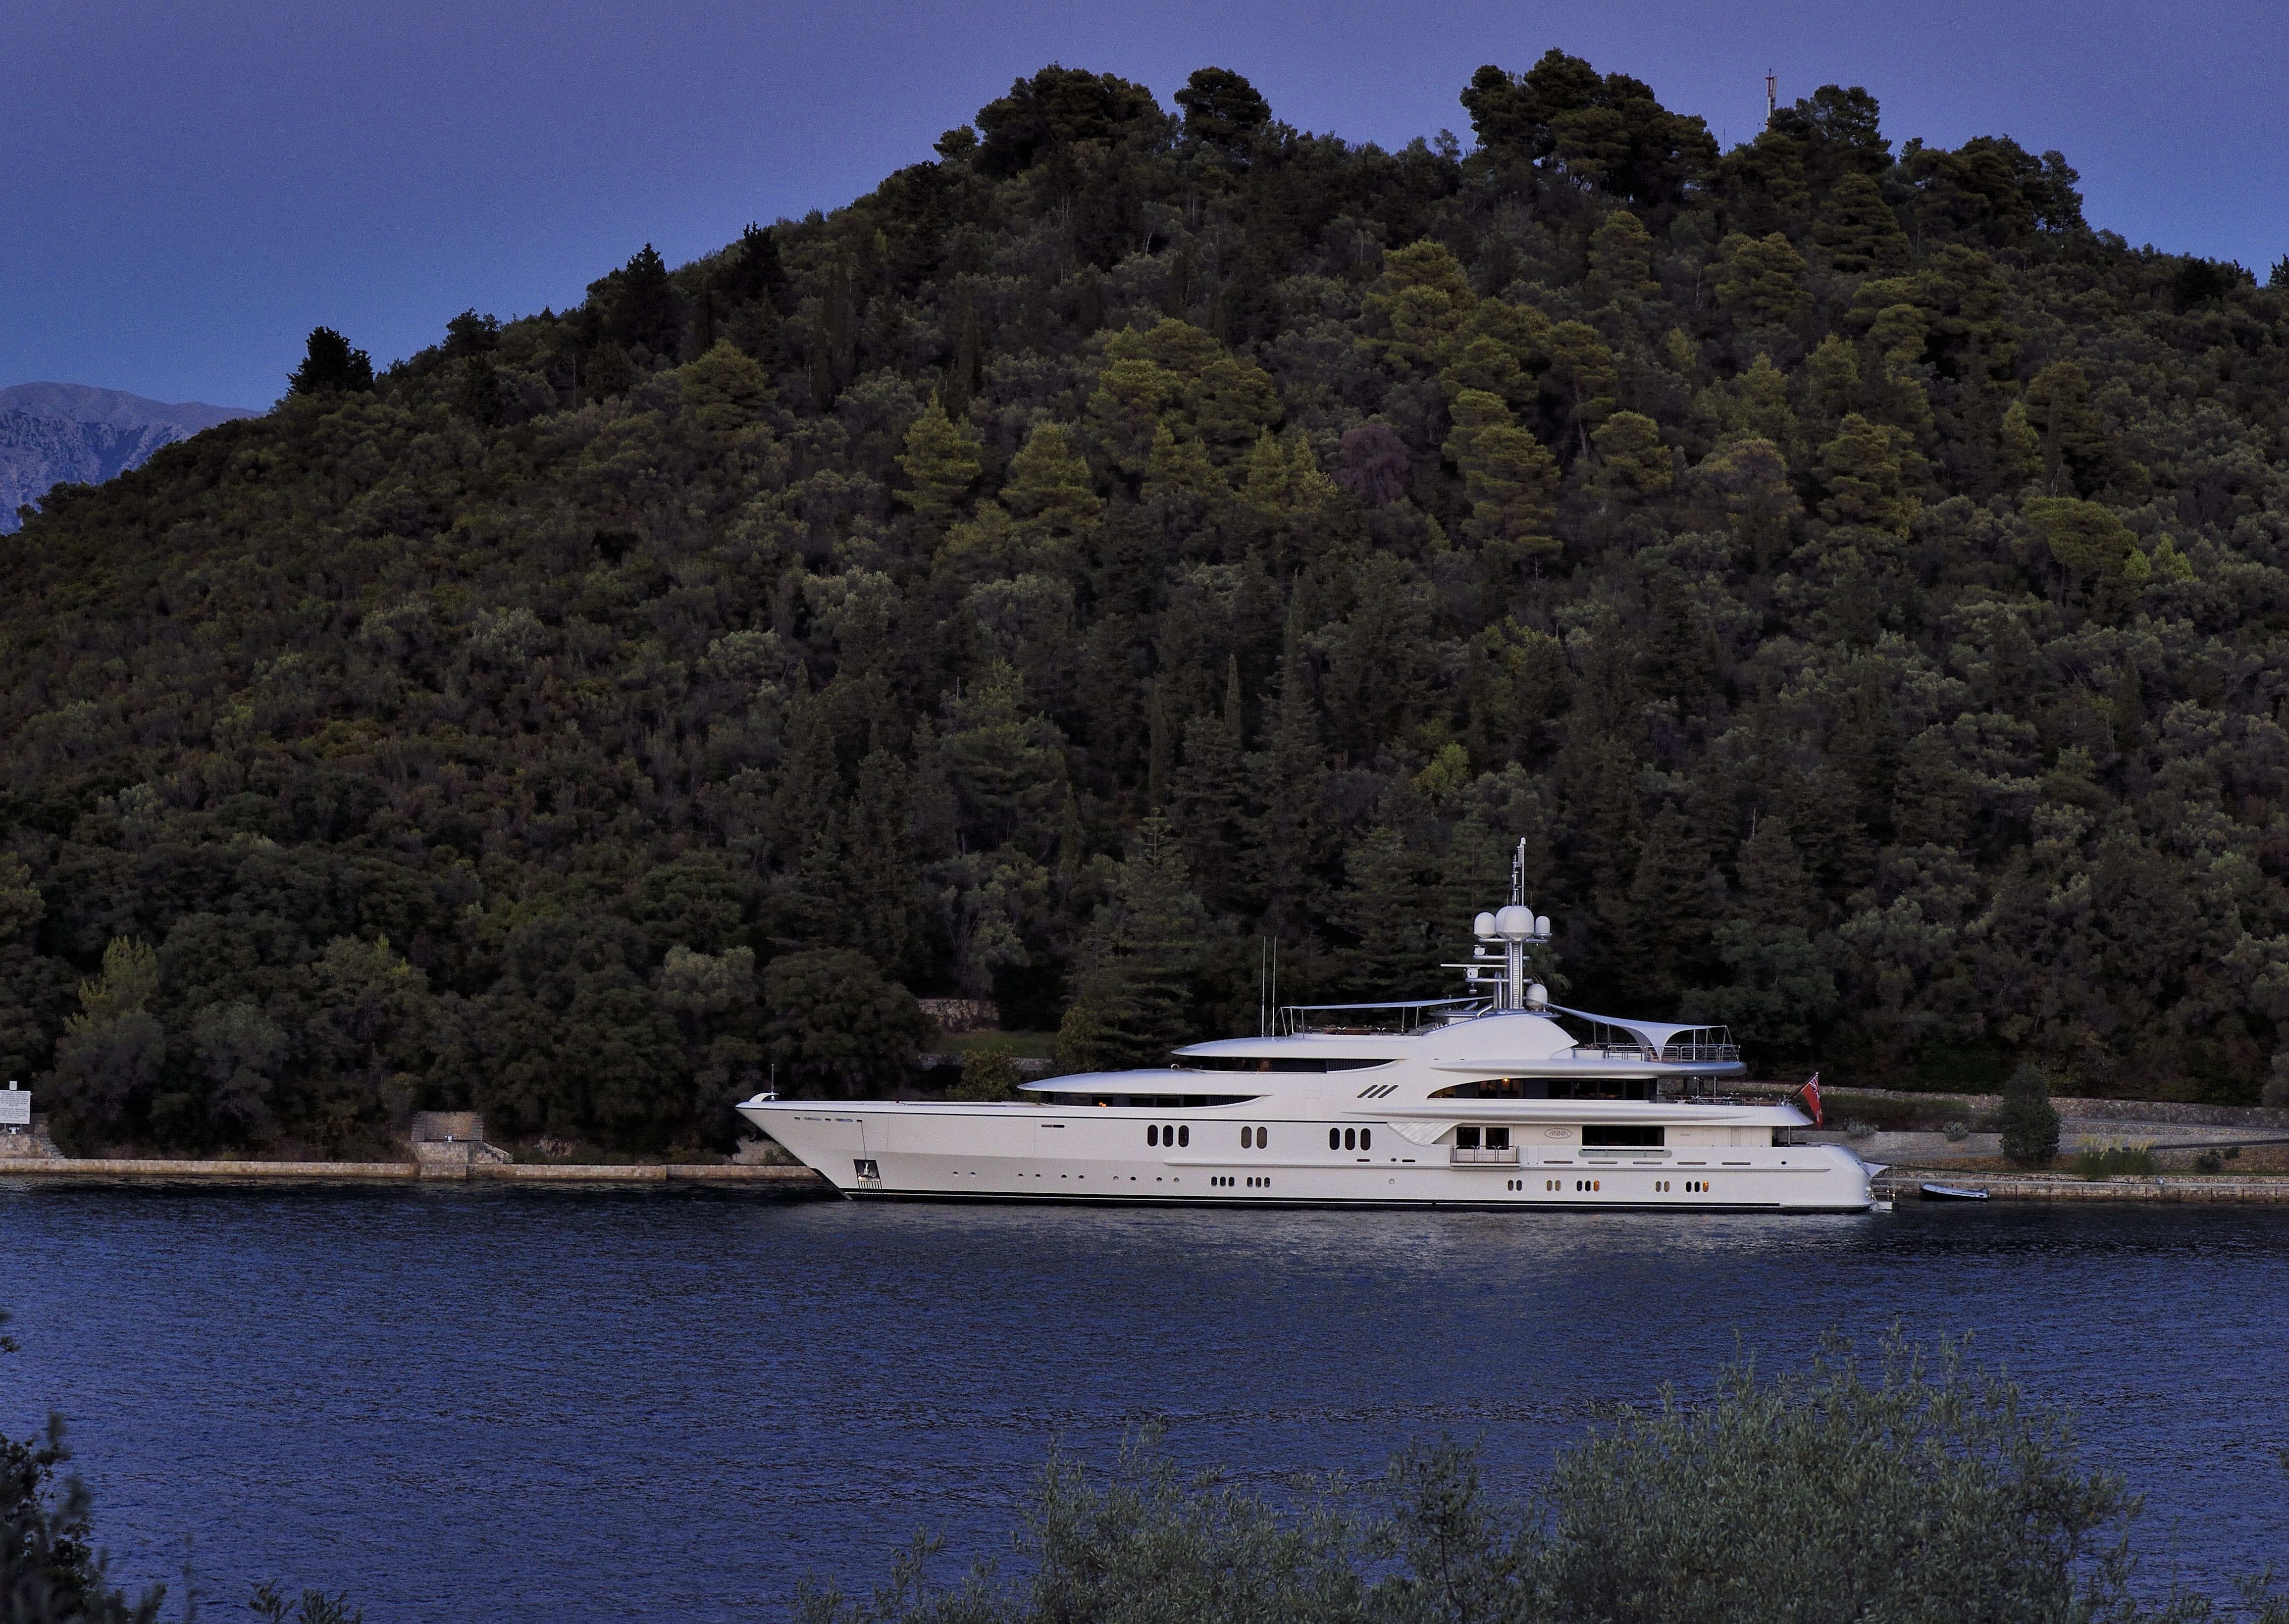 Image of Anna I 67.0M (219.8FT) motor yacht